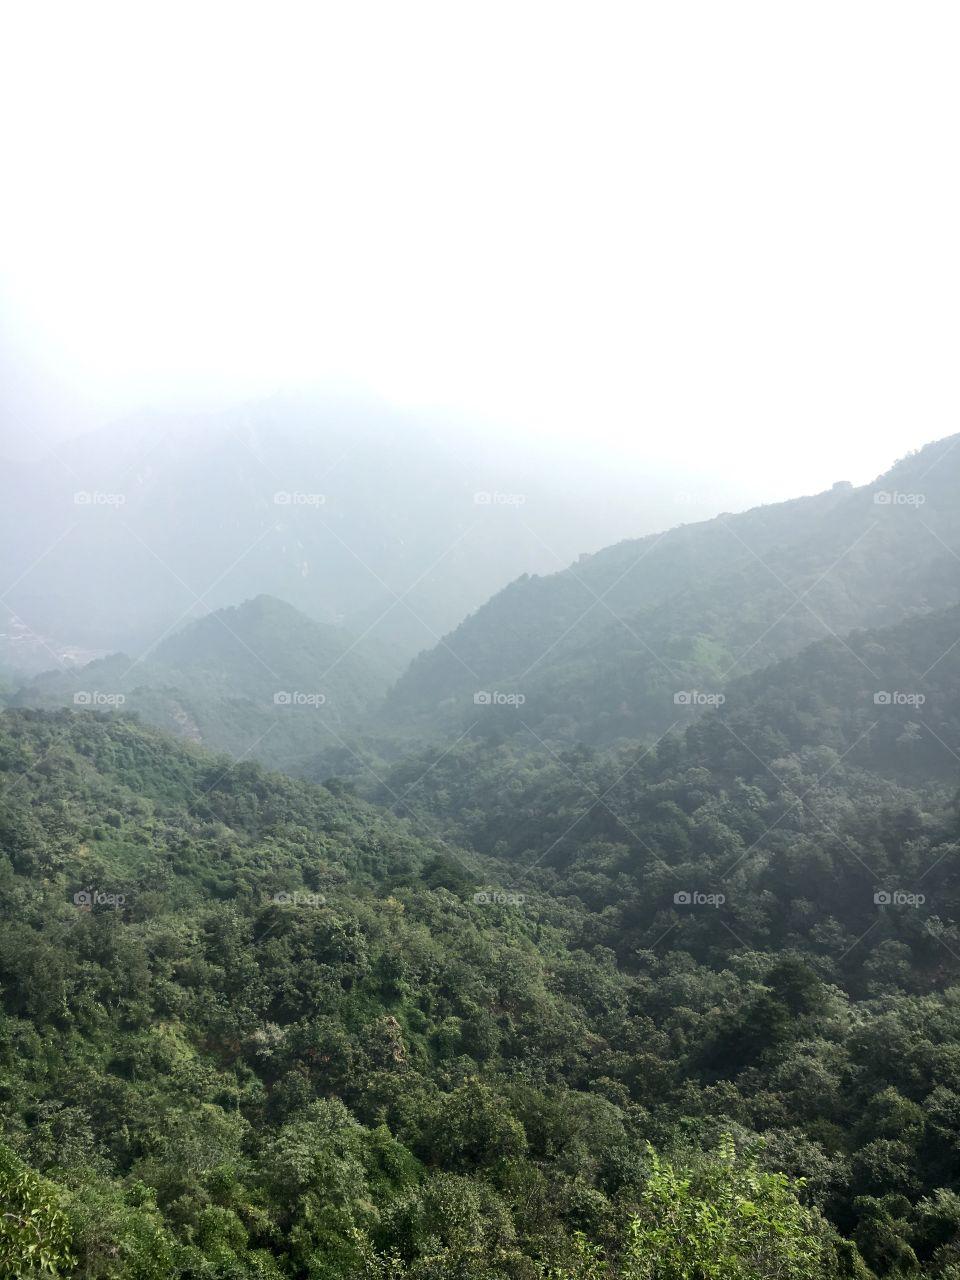 Nature, Landscape, Mountain, Tree, Travel